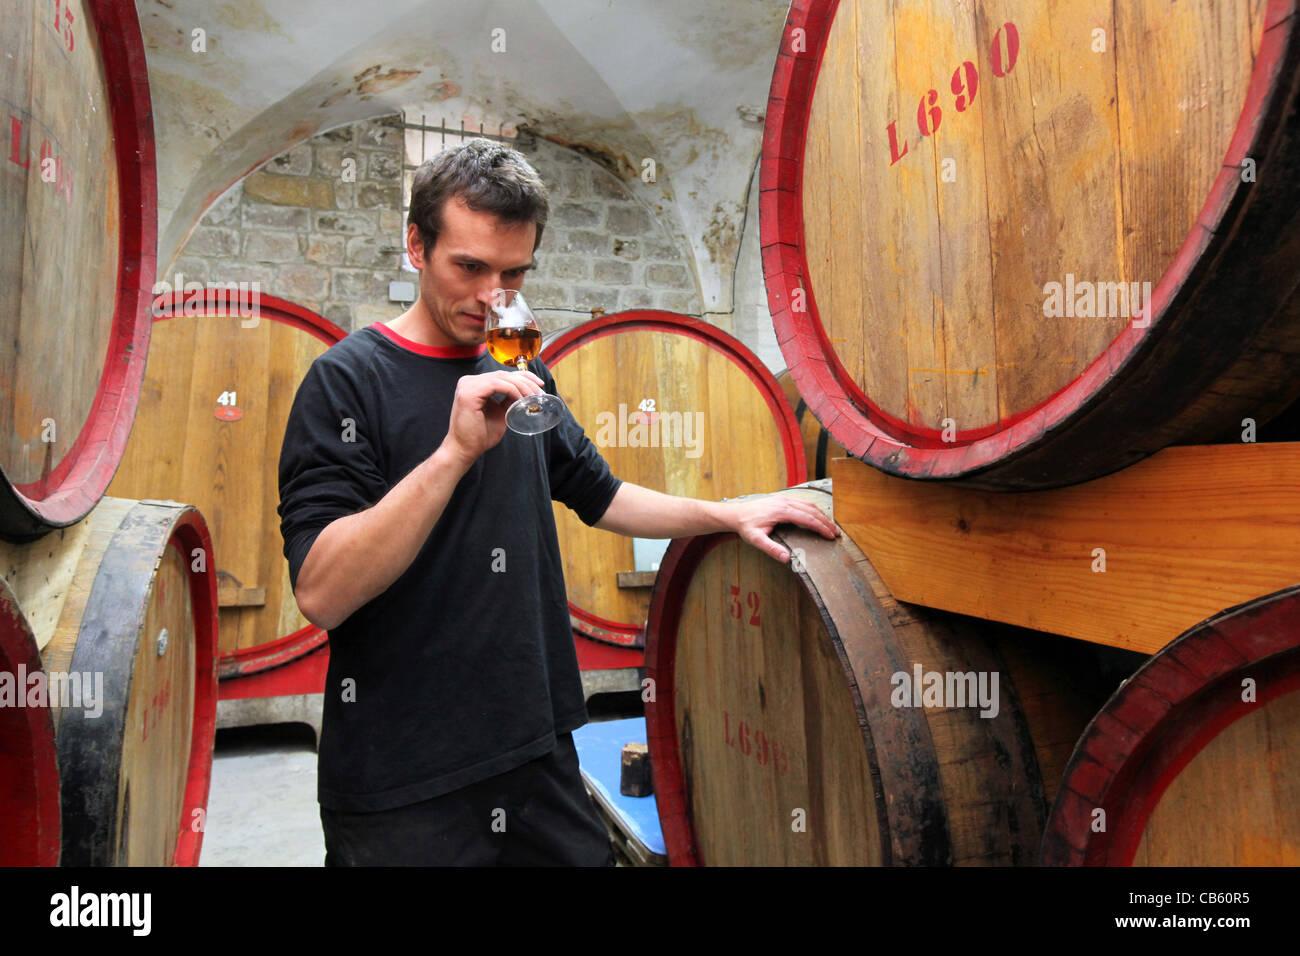 Winemaster tasting Brandy from Oak Barrels in the cellars of Cremisan Winery in Beit Jala near Bethlehem, Palestine Stock Photo